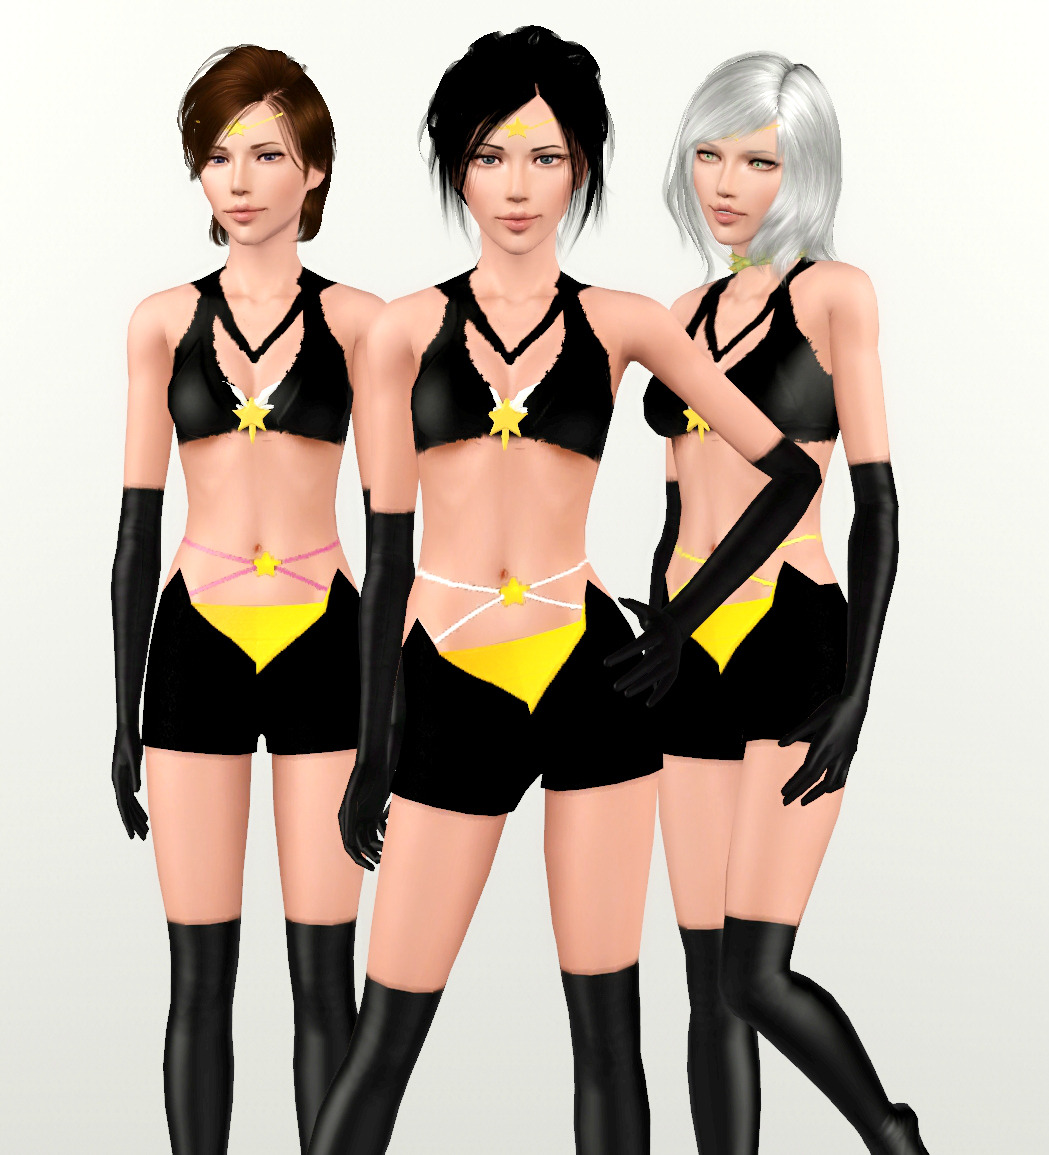 The Sims - Page 2 Tumblr_m7hz1zB7cb1rv6xiho1_1280